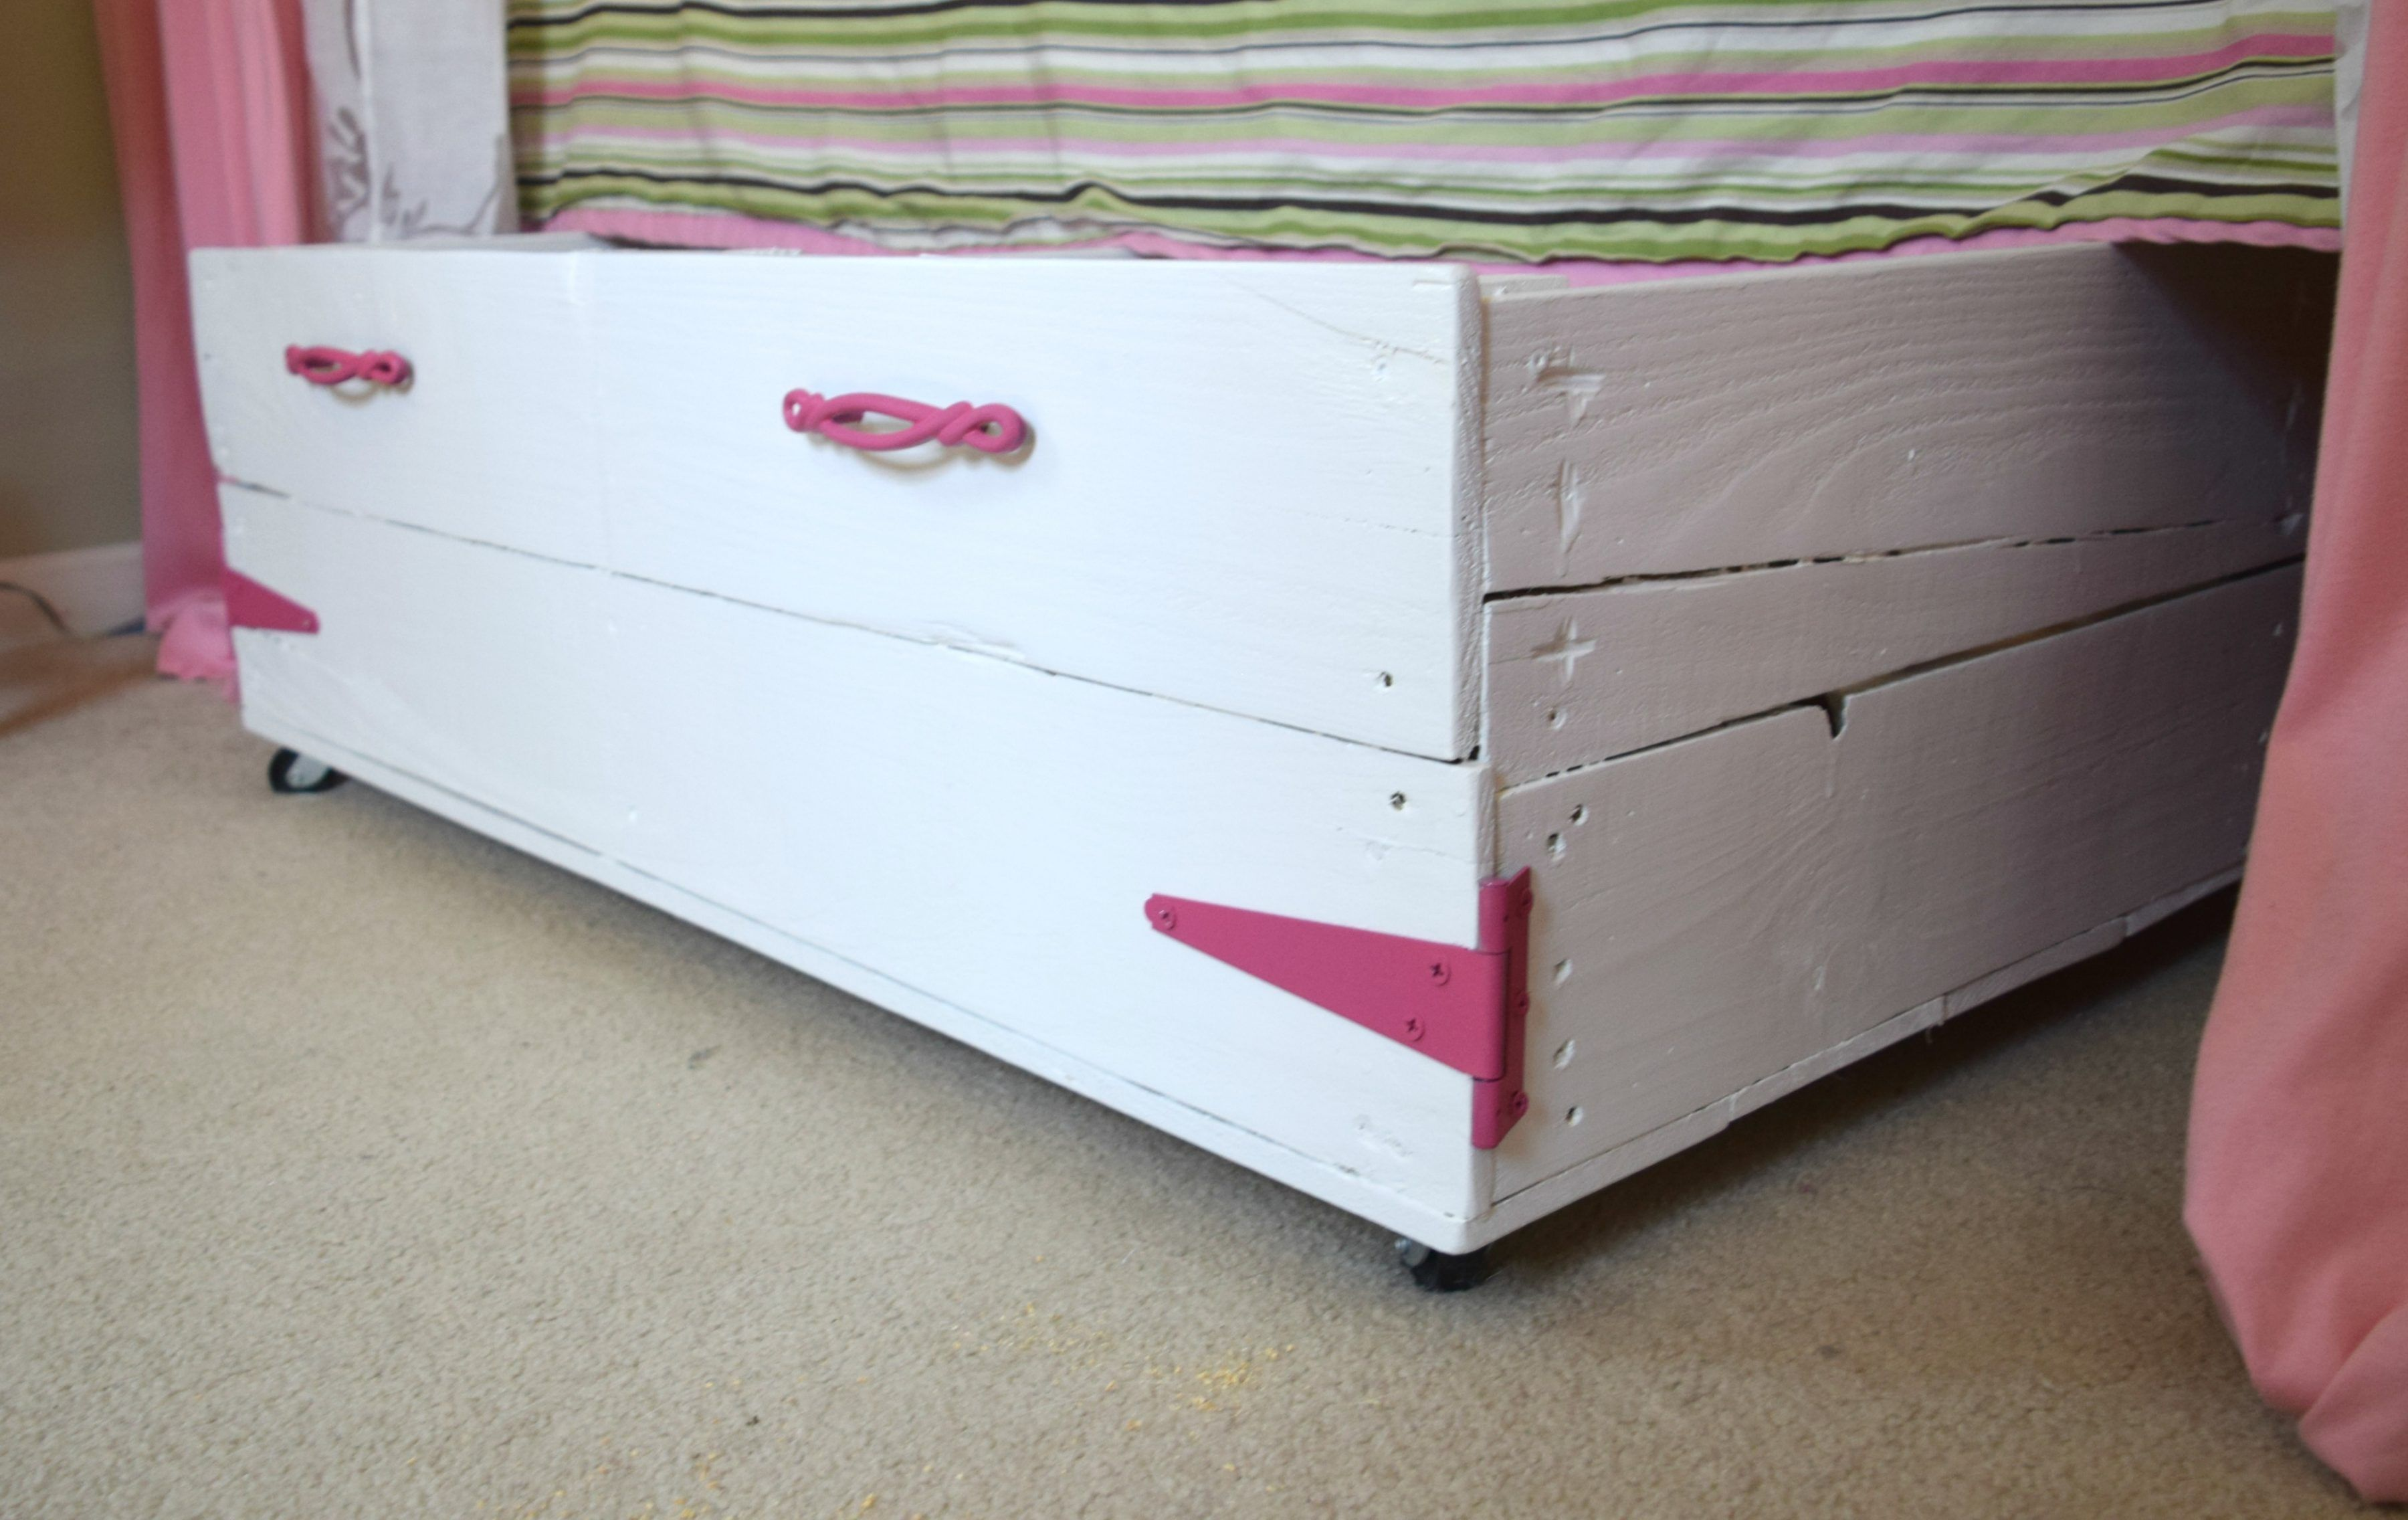 diywoodpalletbox Wood pallets, Toy storage, Pallet